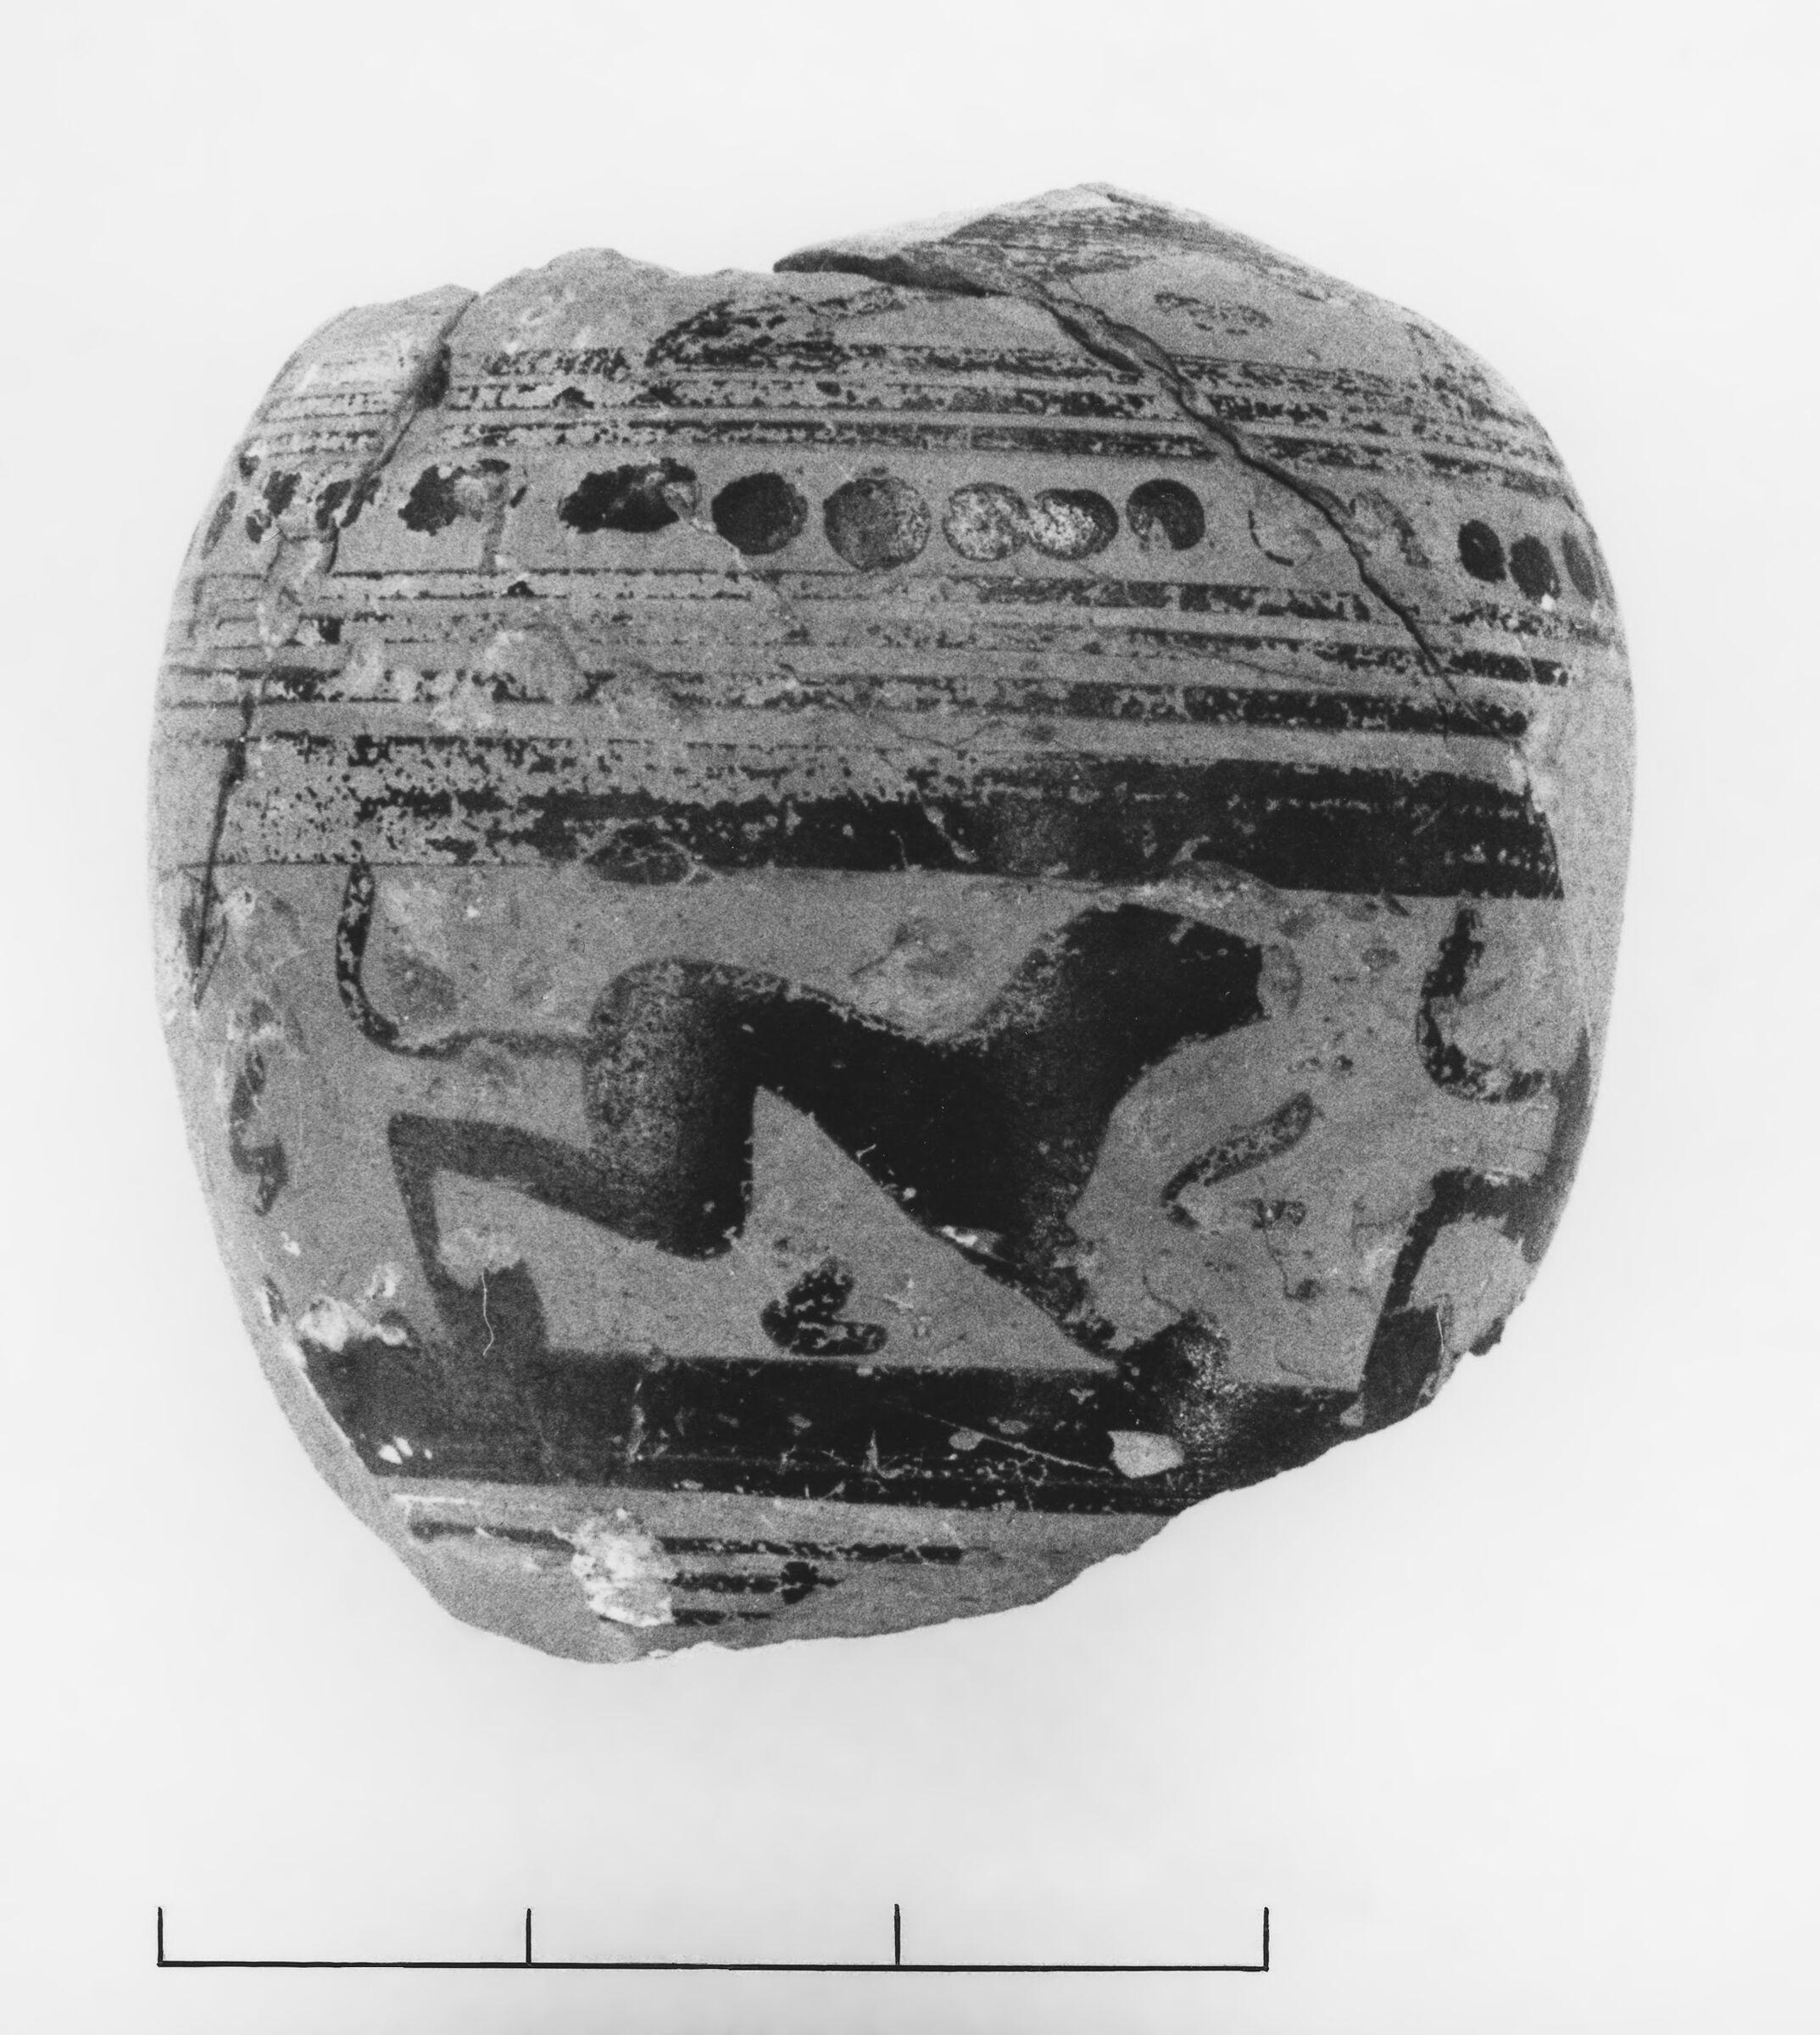 Middle Protocorinthian Ovoid Aryballos Fragment